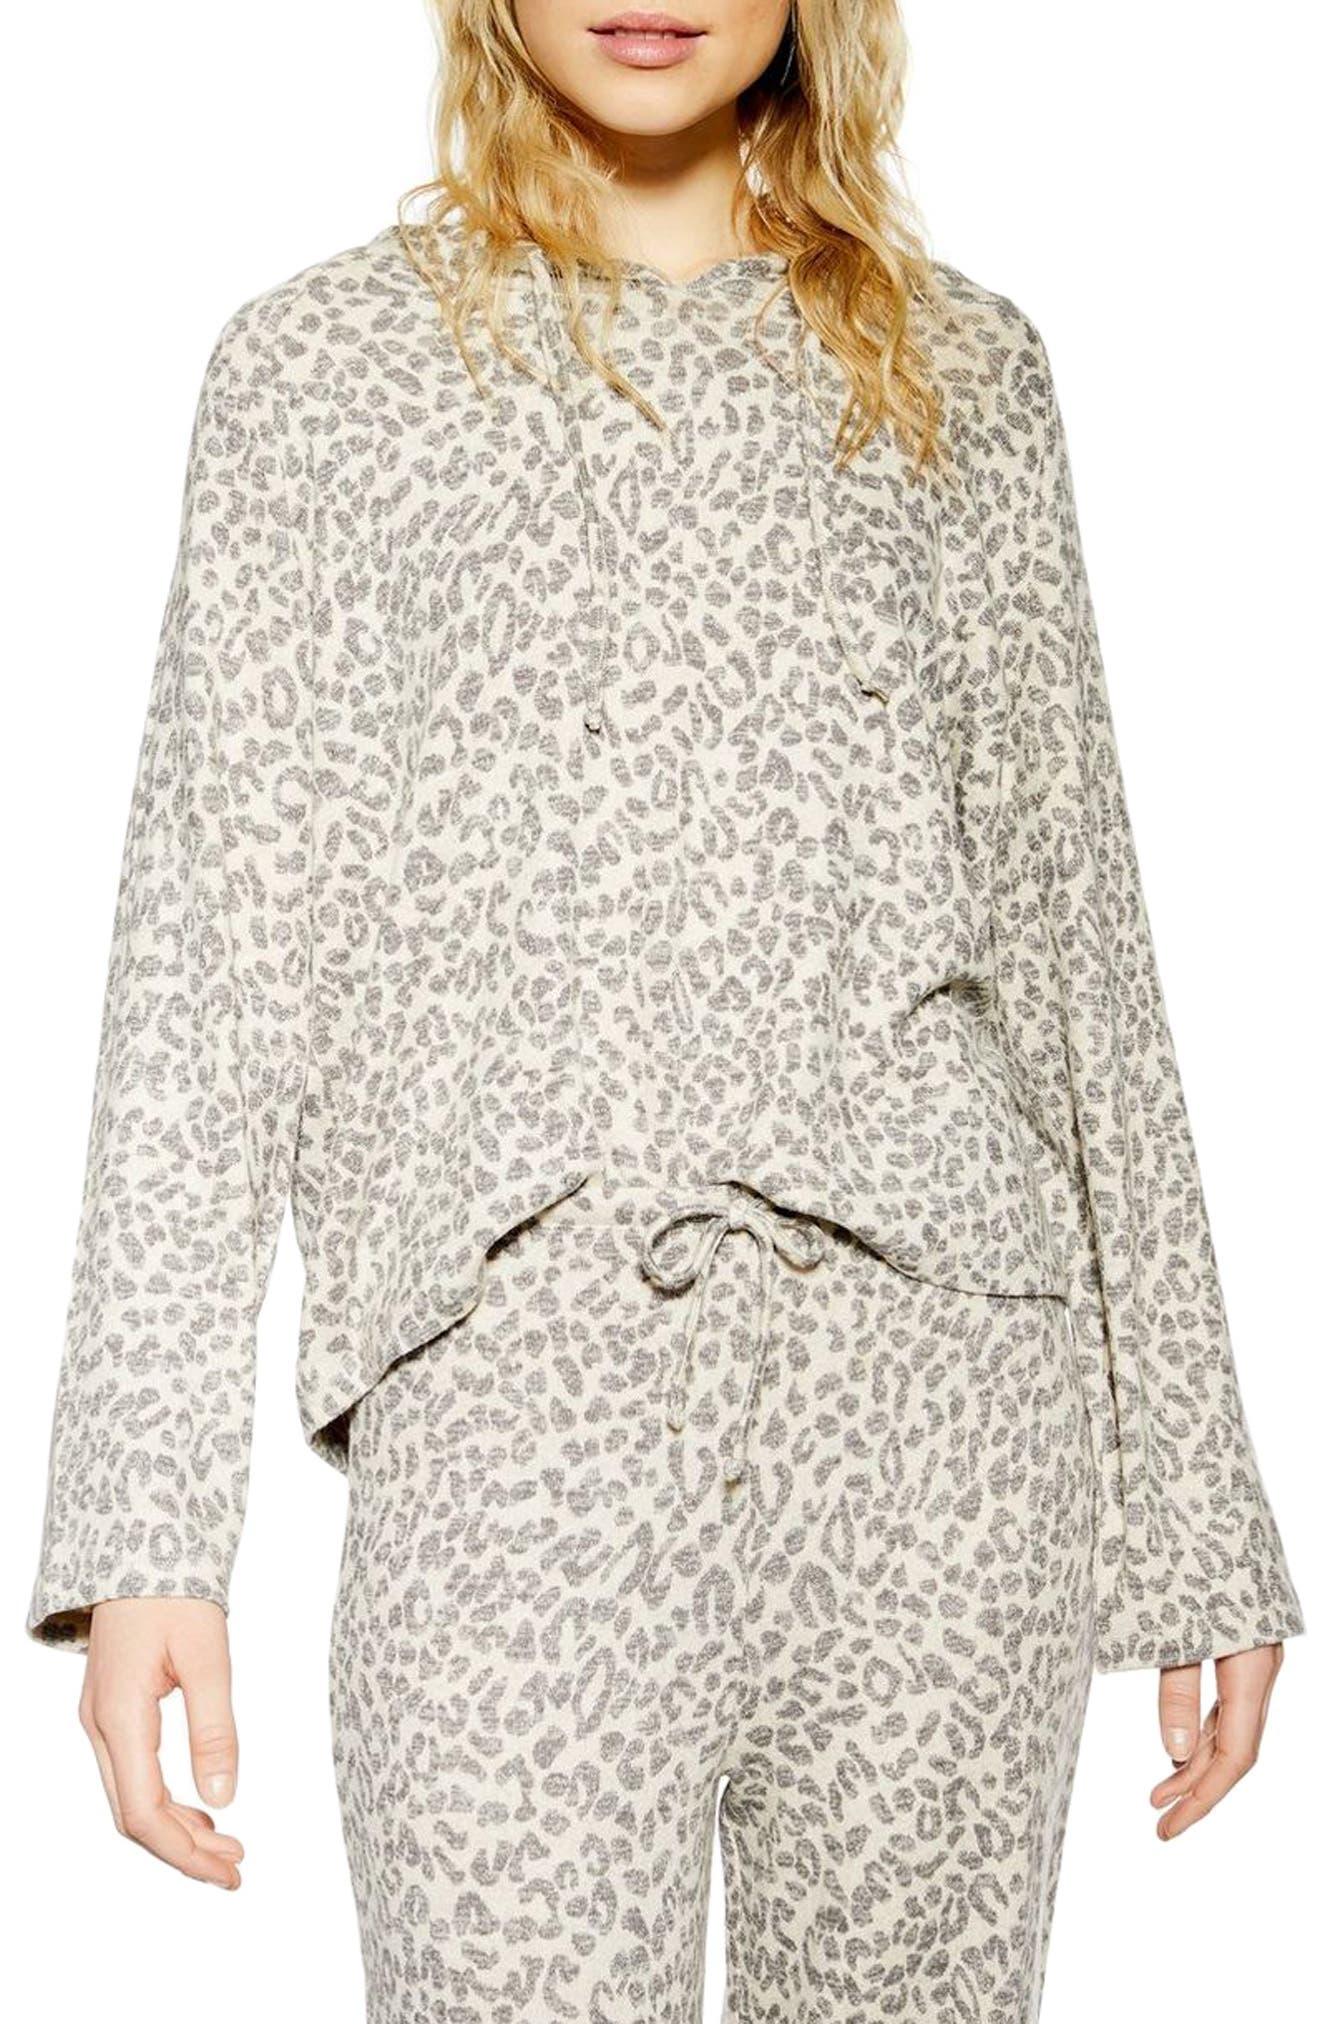 Soft Lounge Hooded Sweatshirt, Main, color, BROWN MULTI